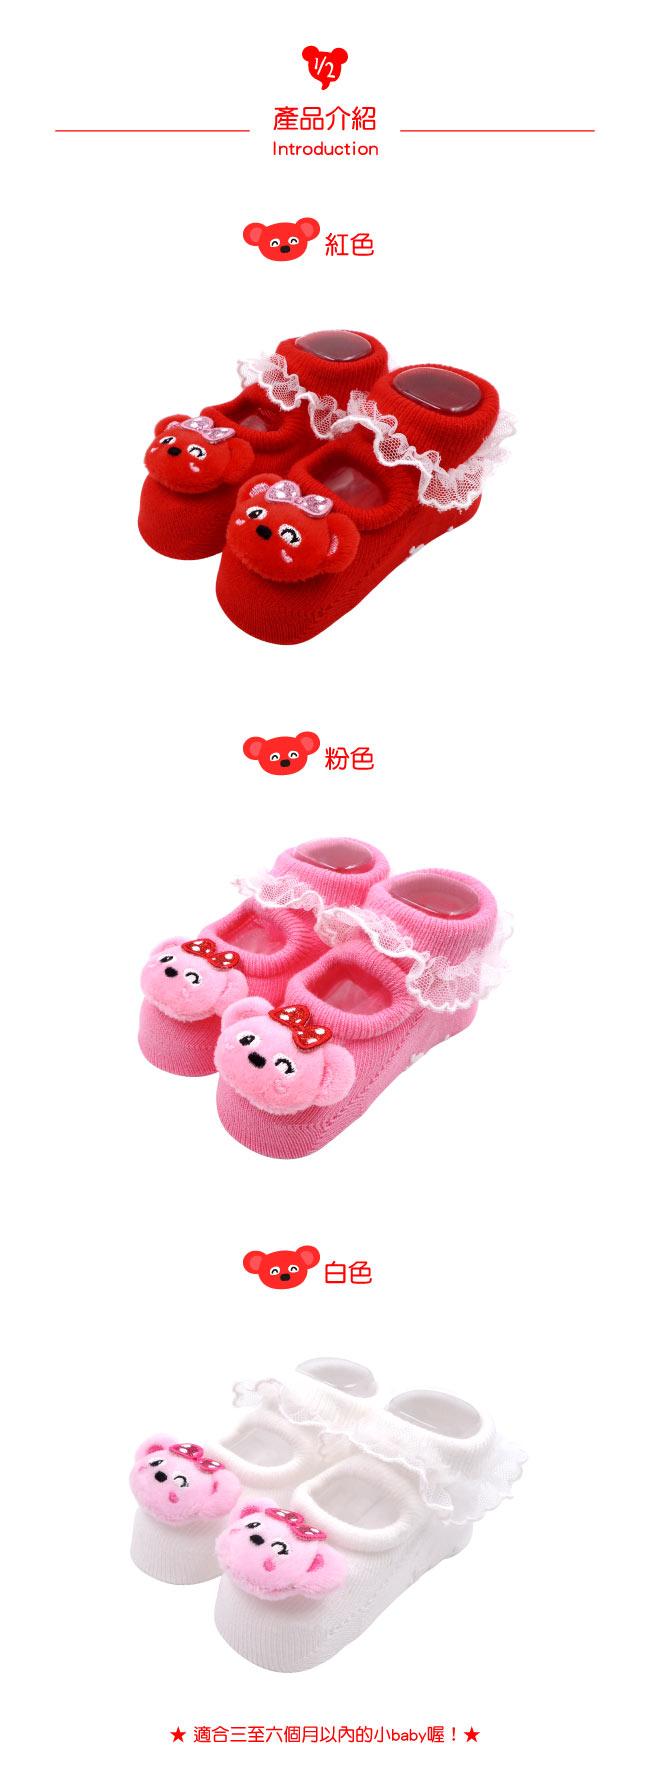 WHY AND 1/2 mini 蕾絲花邊寶寶鞋襪 多色可選